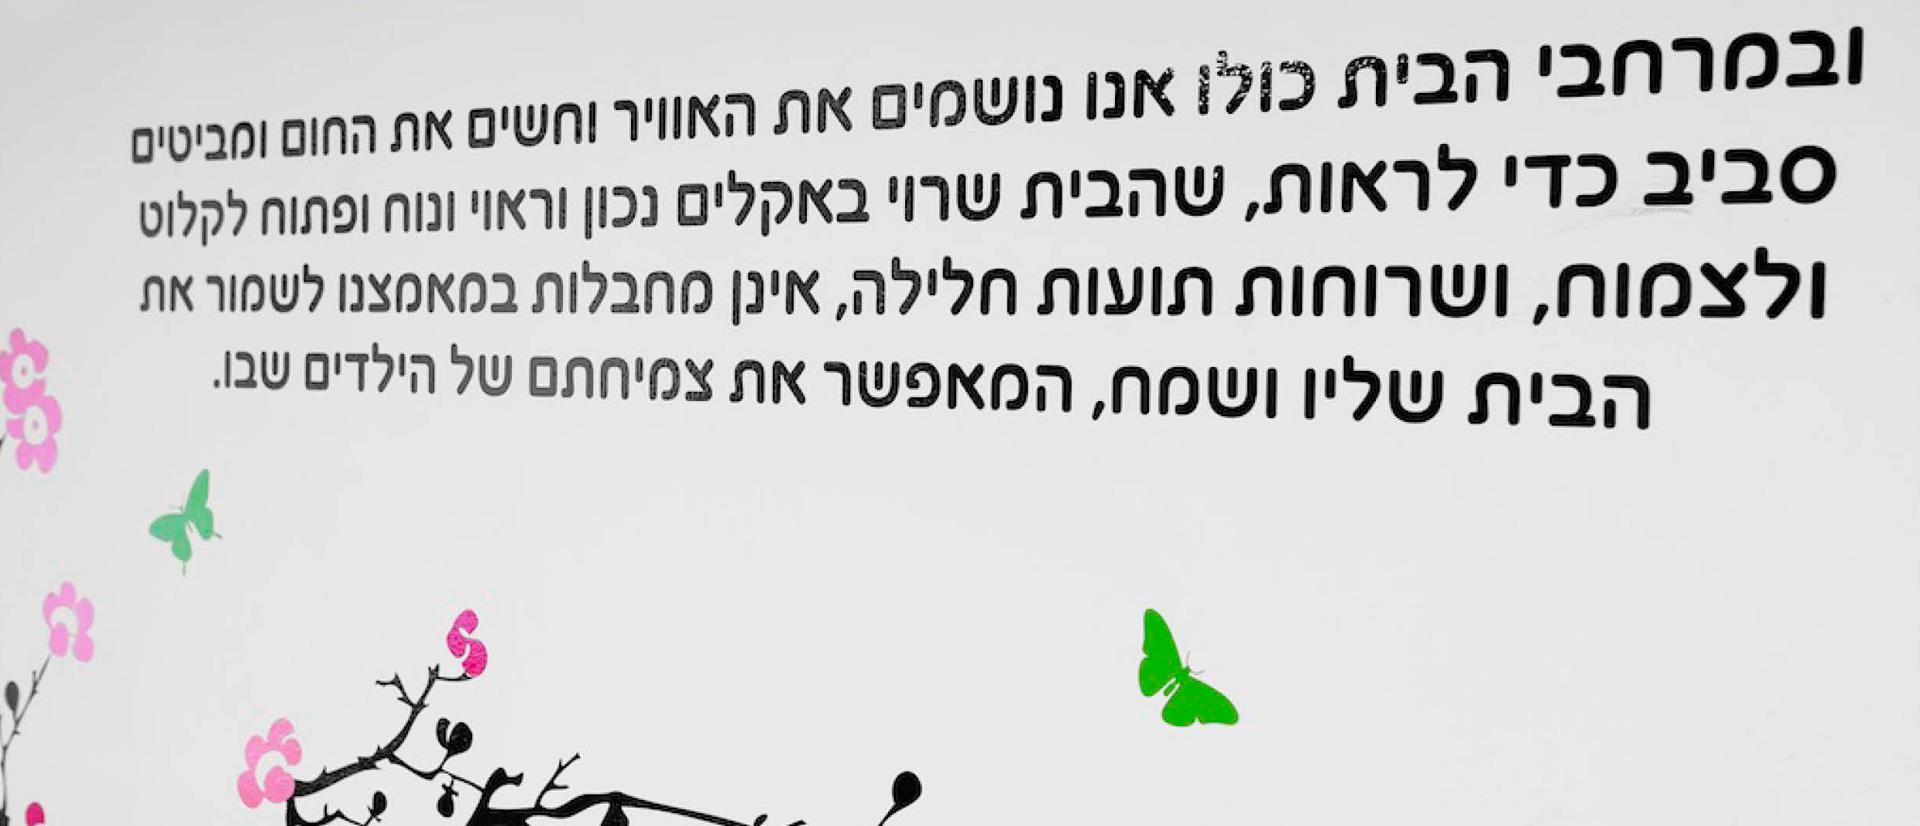 Baram_Web_01_2422 copy